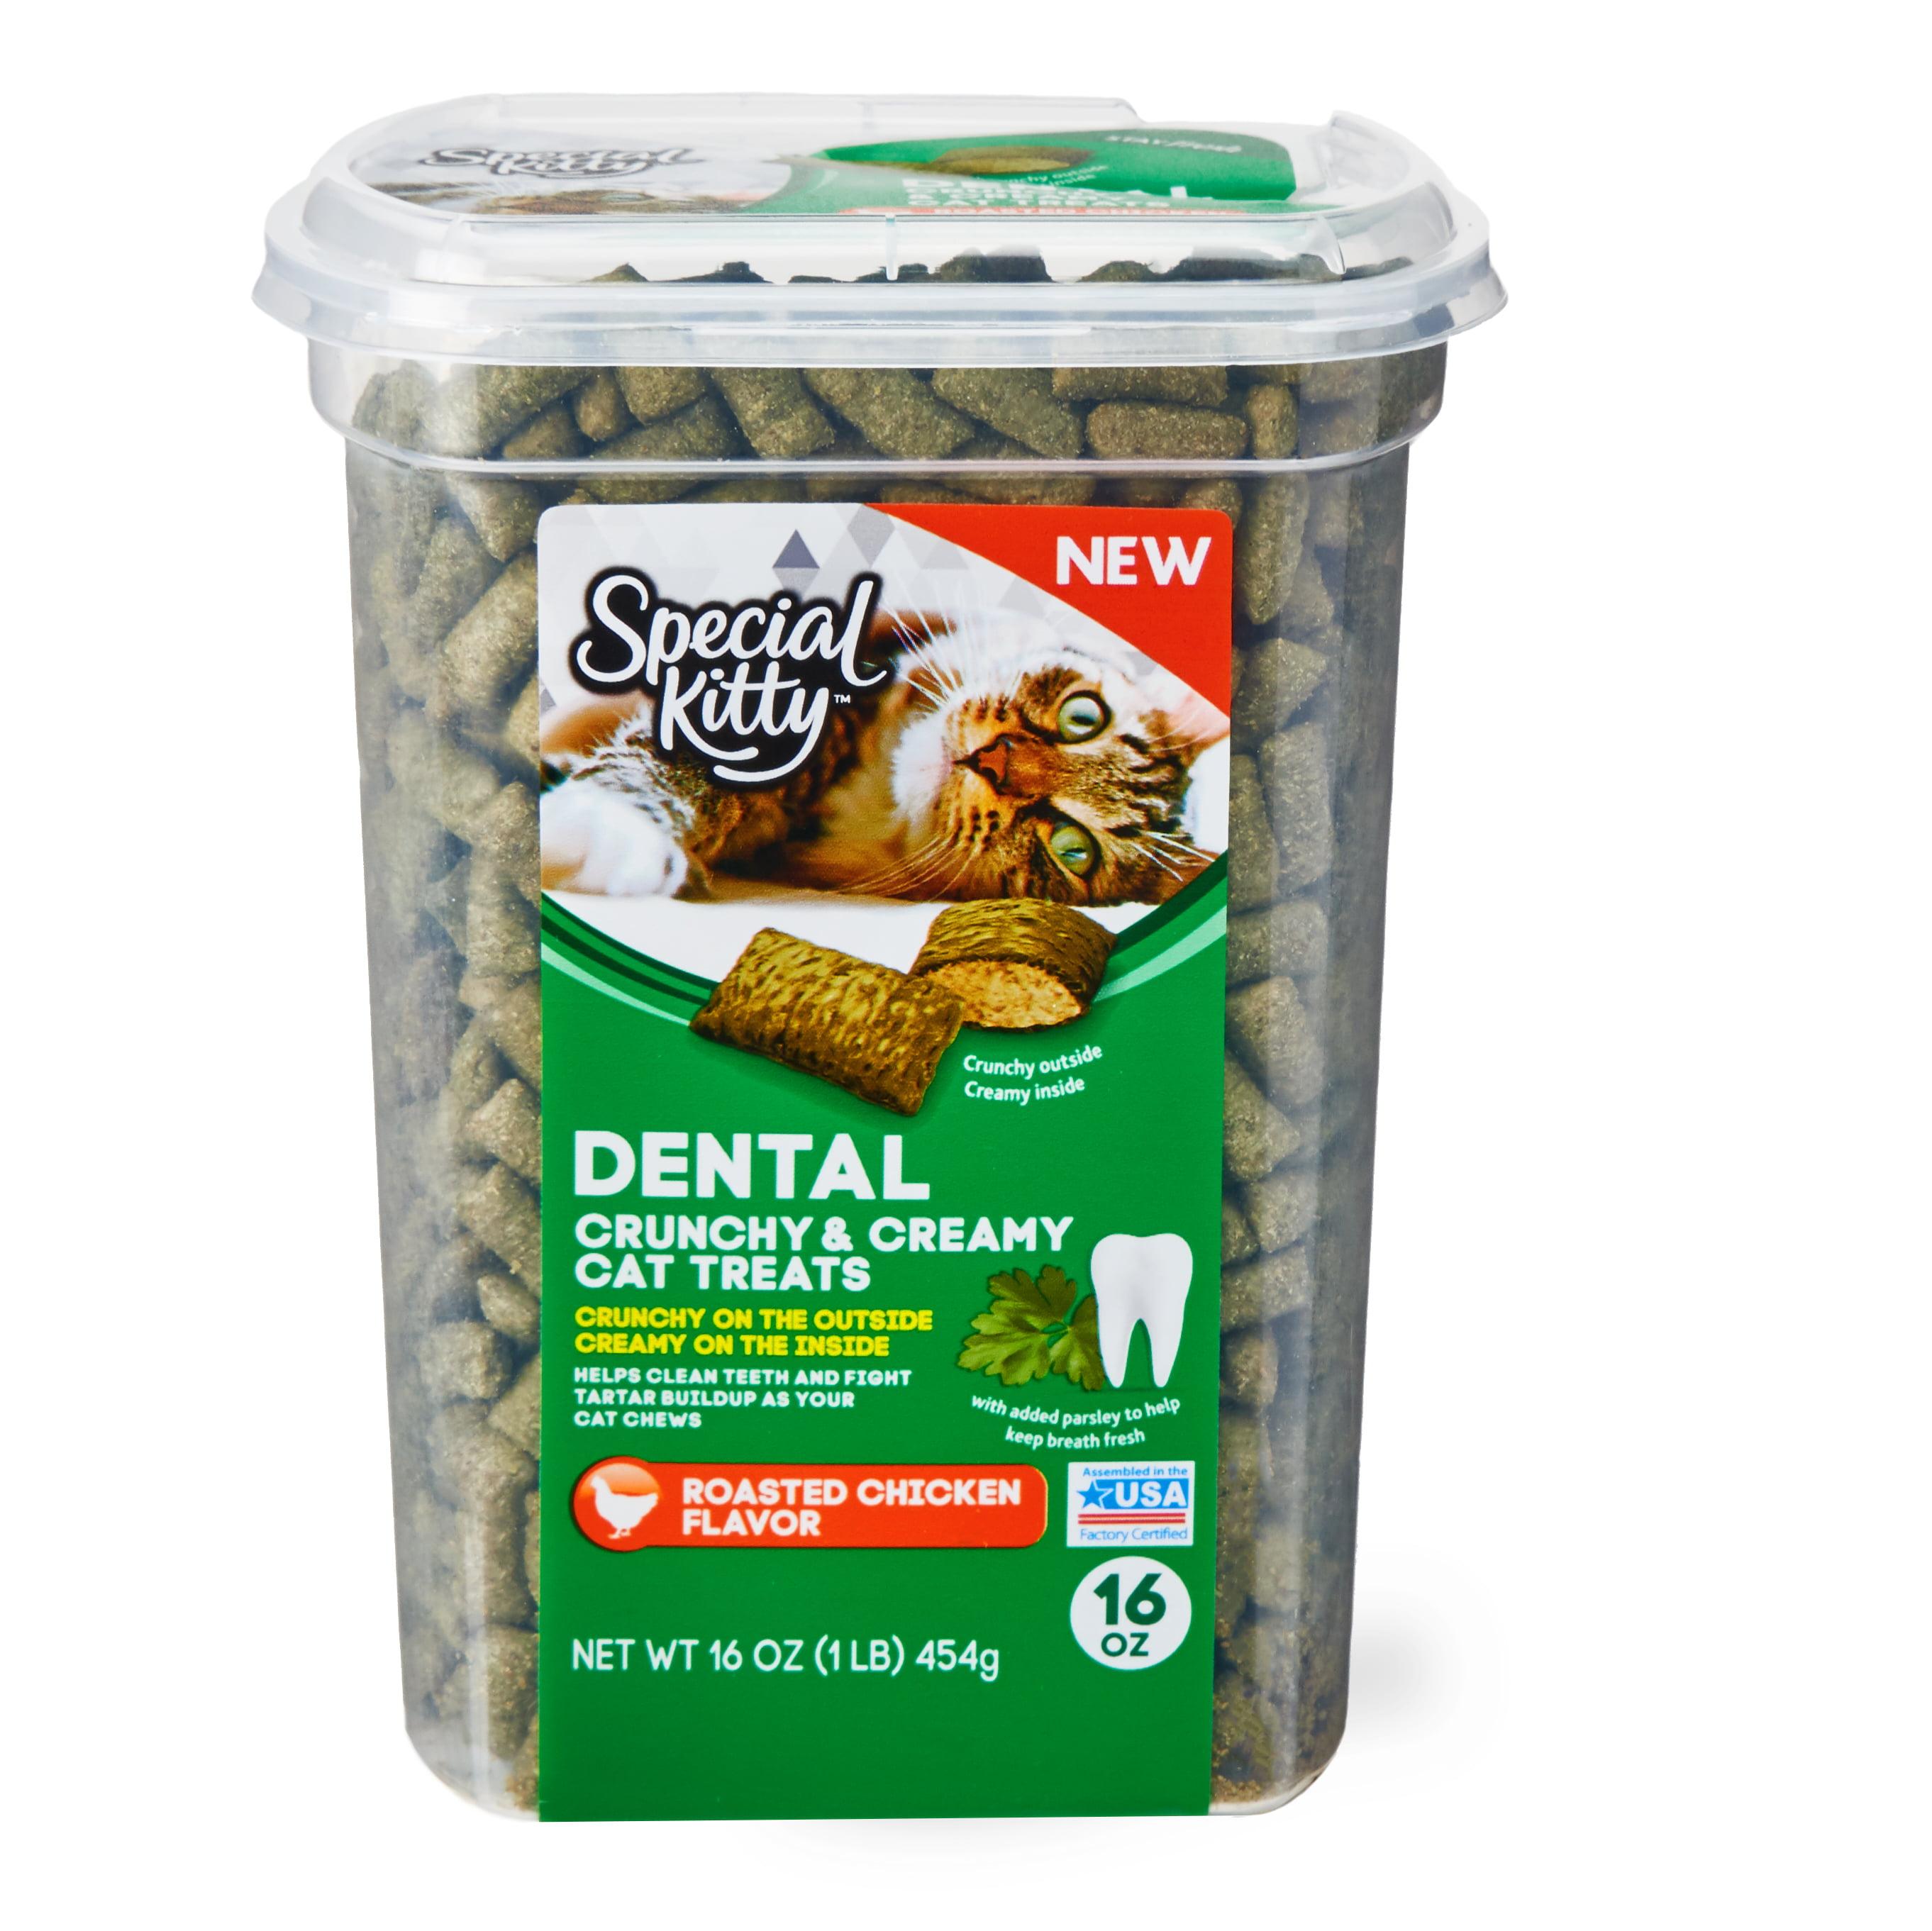 Special Kitty Dental Crunchy & Creamy Cat Treats, Chicken Flavor, 16 oz